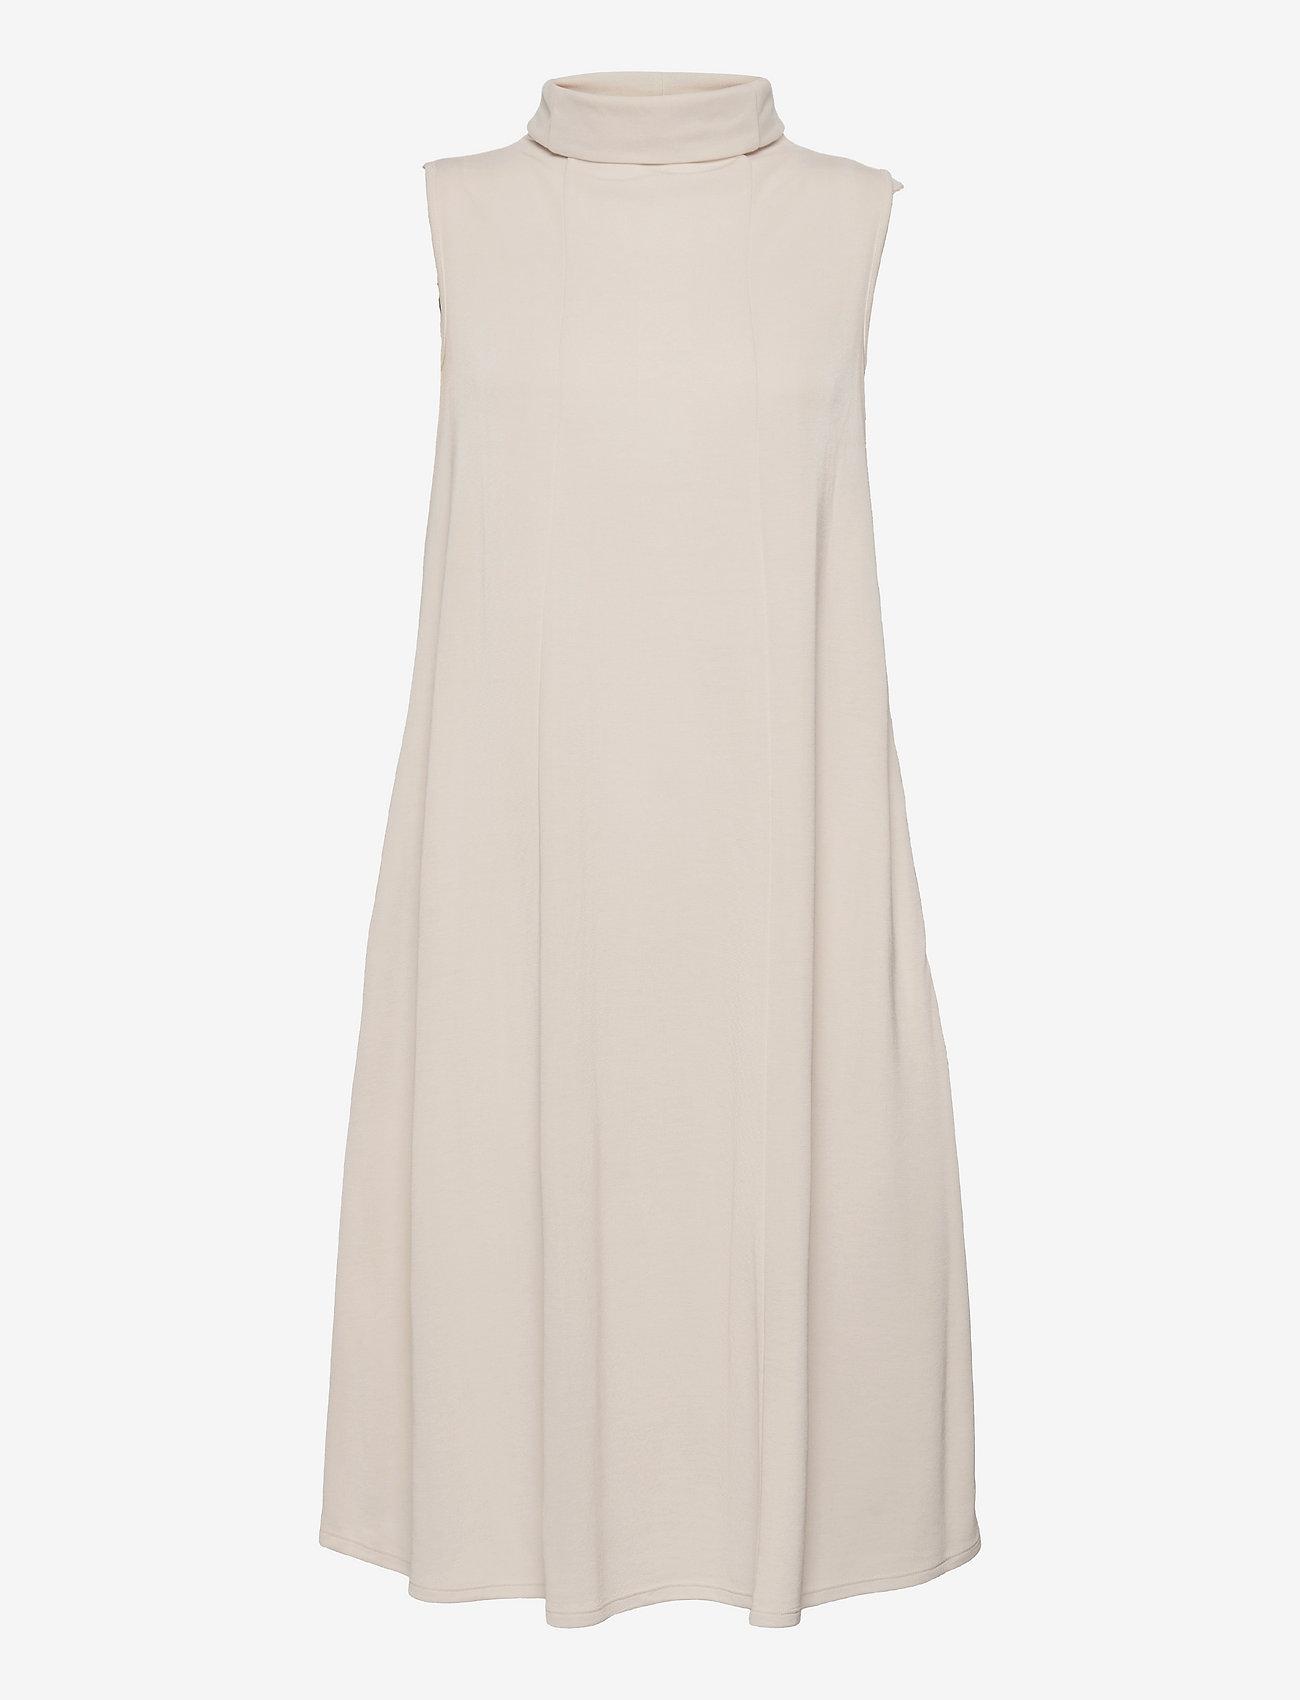 Max Mara Leisure - FANTINO - summer dresses - beige - 0